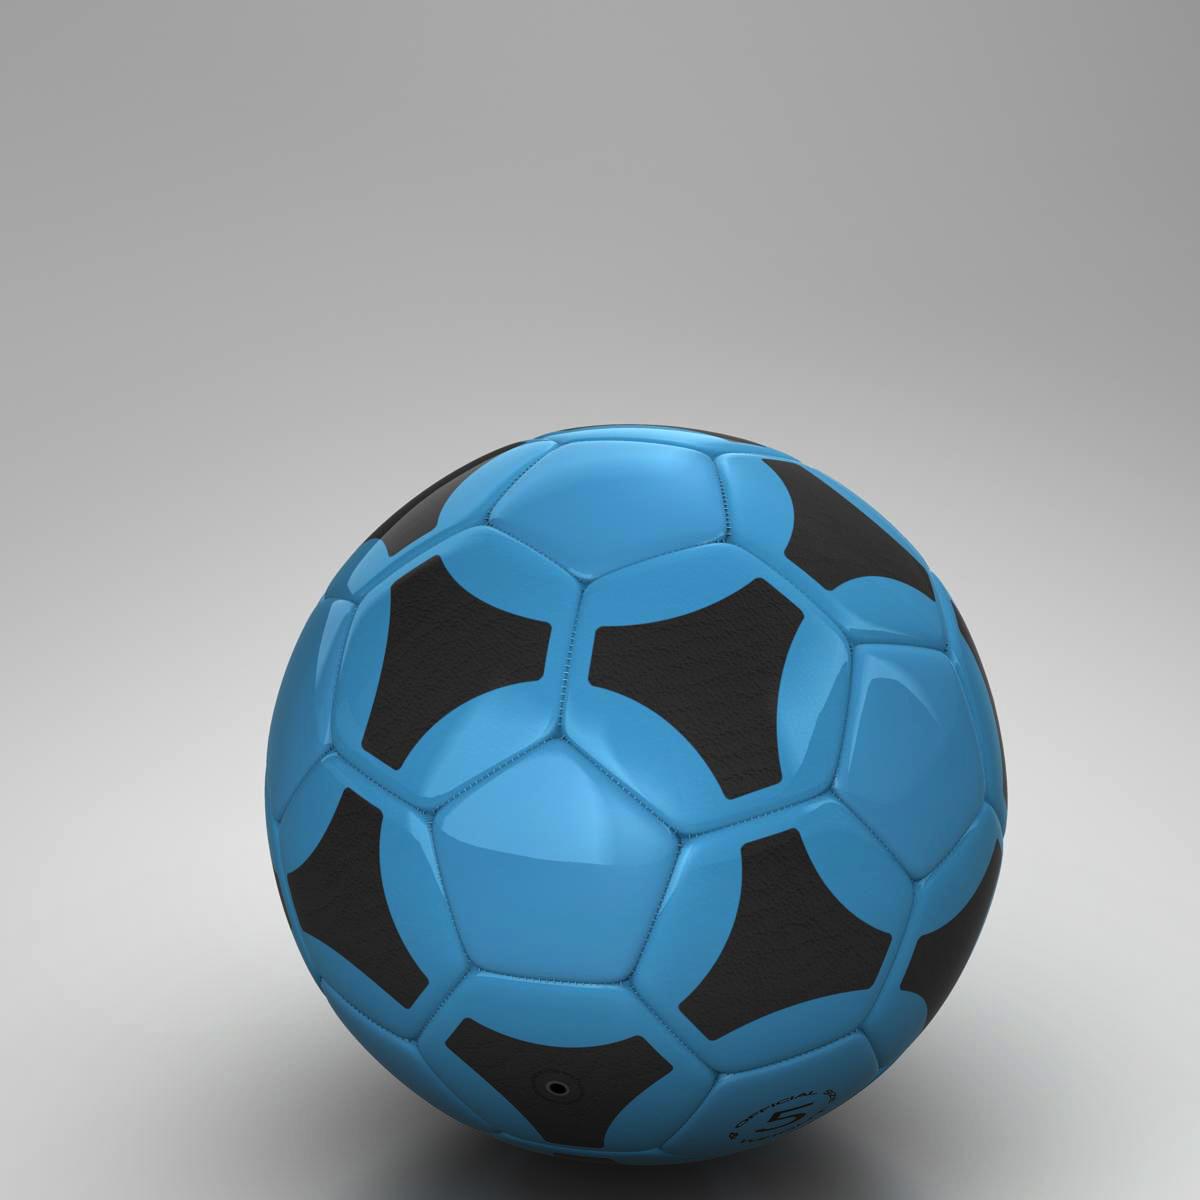 soccerball цэнхэр хар 3d загвар 3ds max fbx c4d ma mb obj 204382